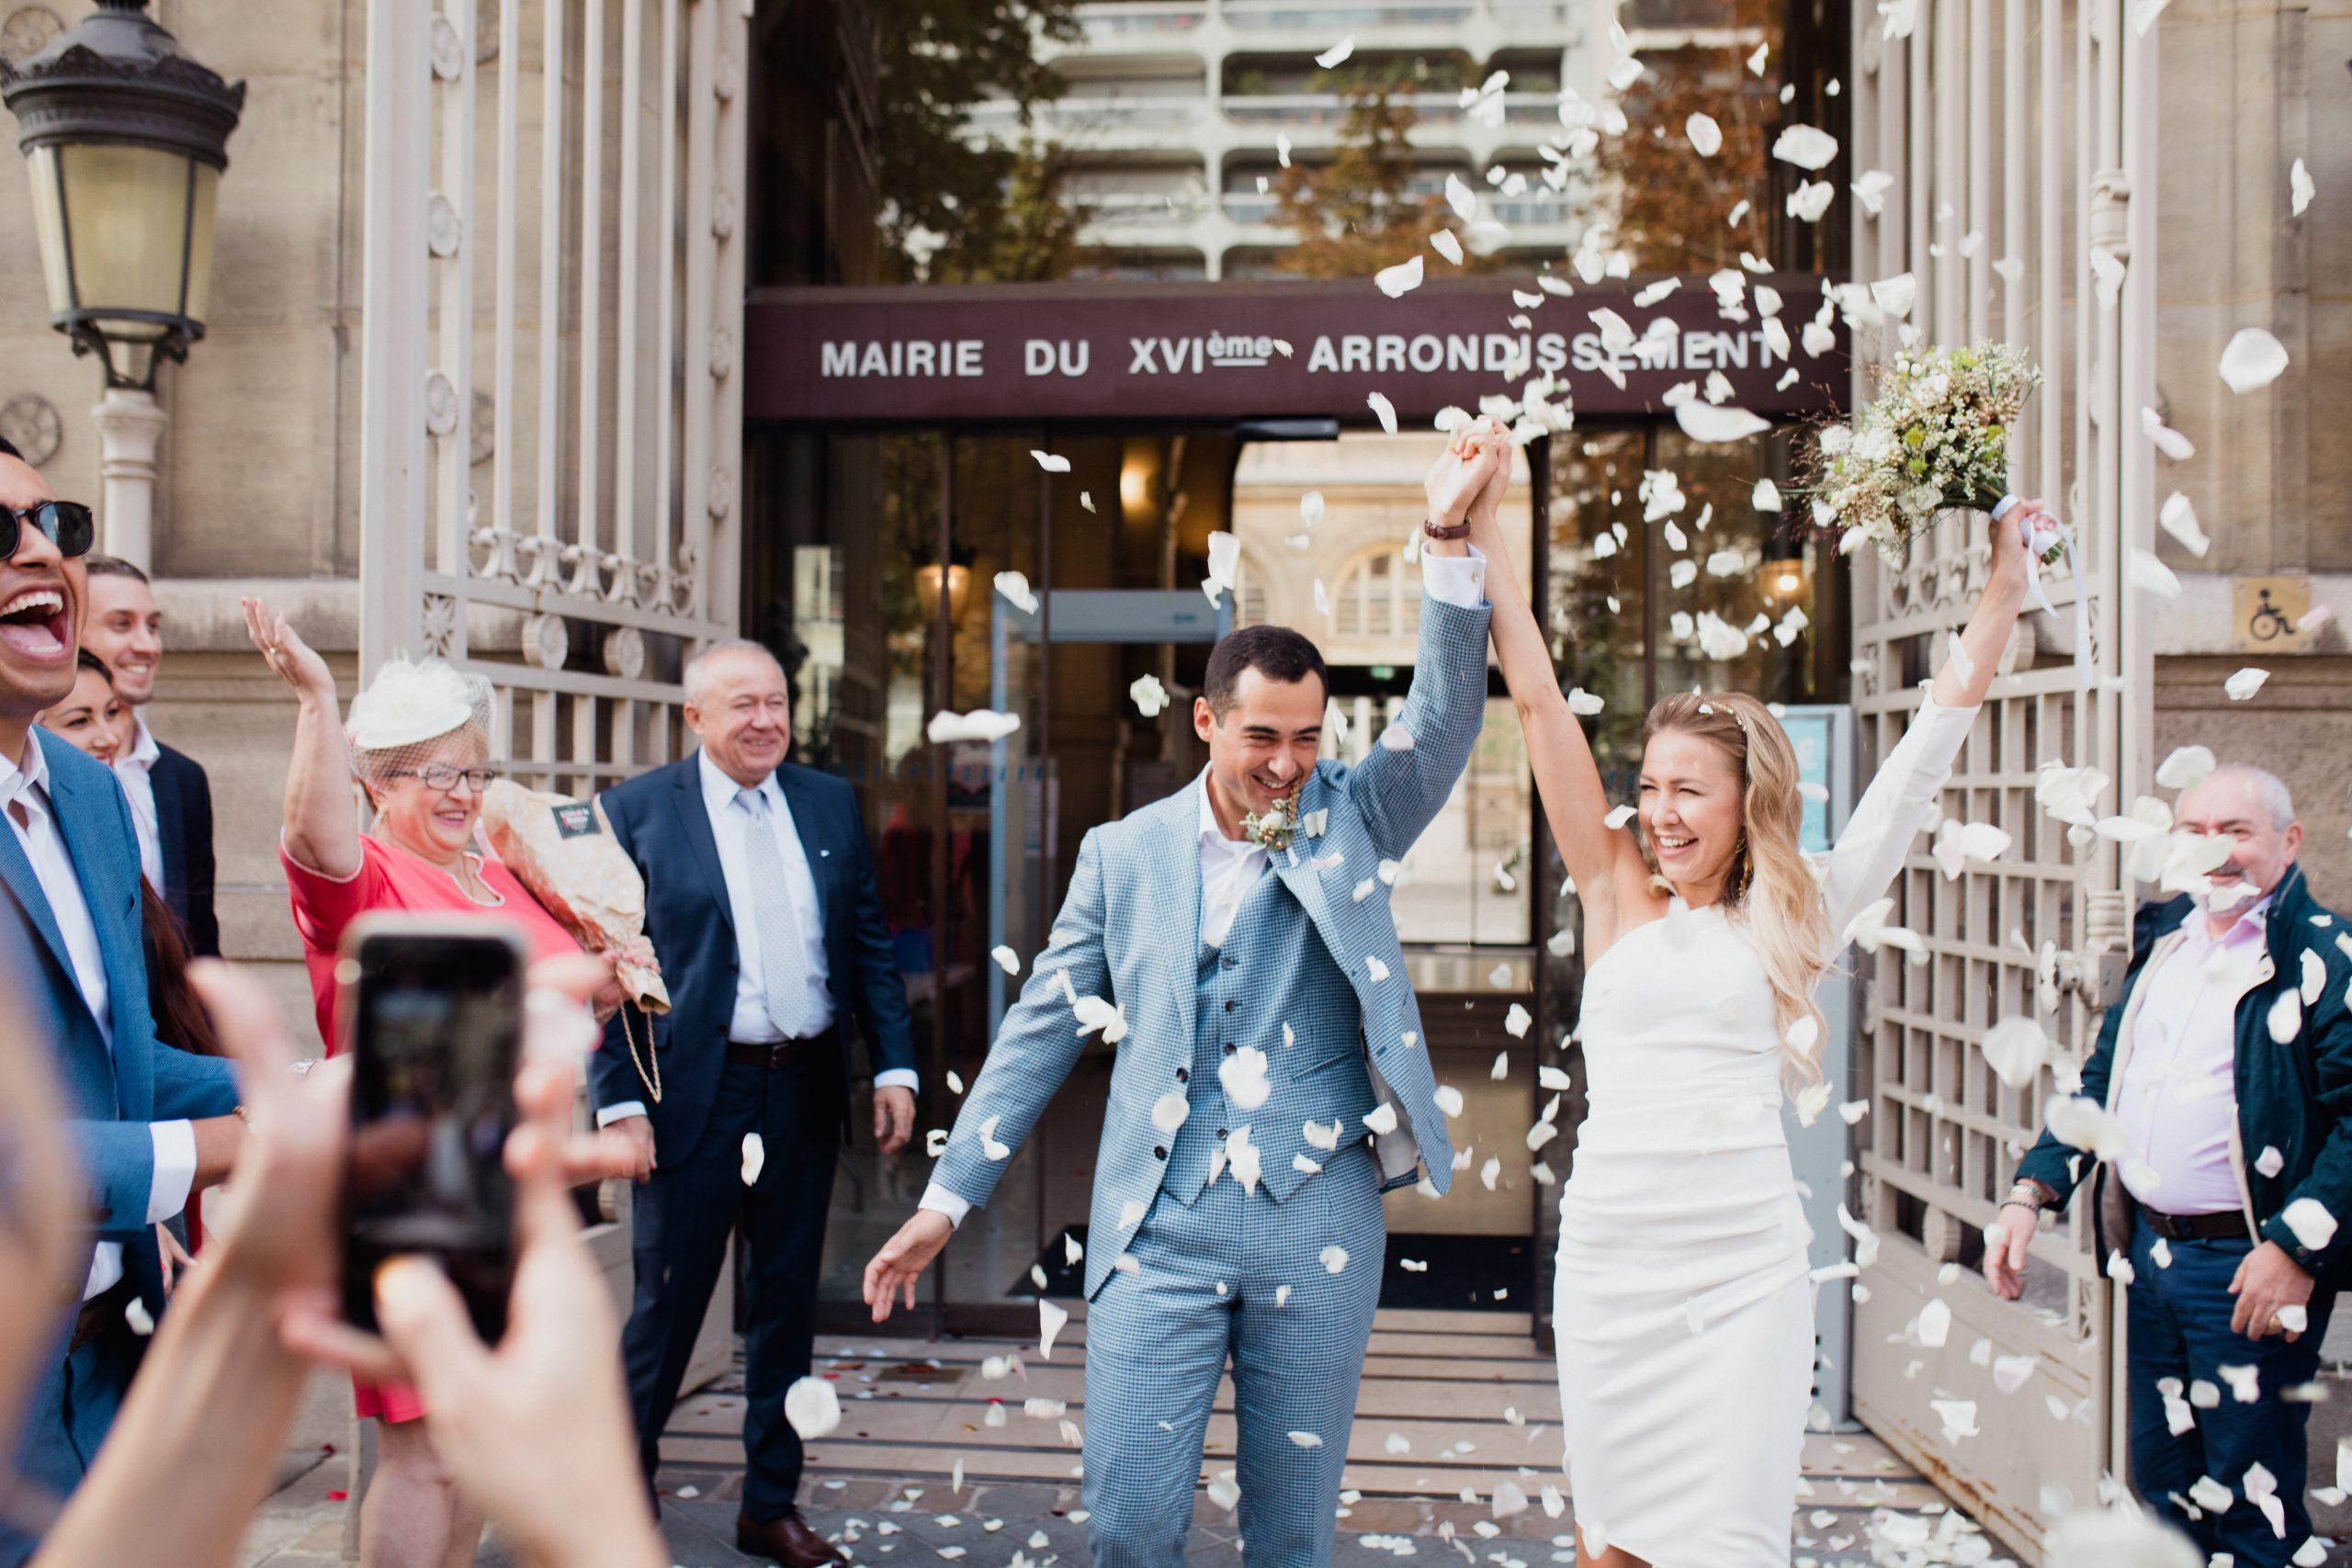 choisir un bon photographe de mariage